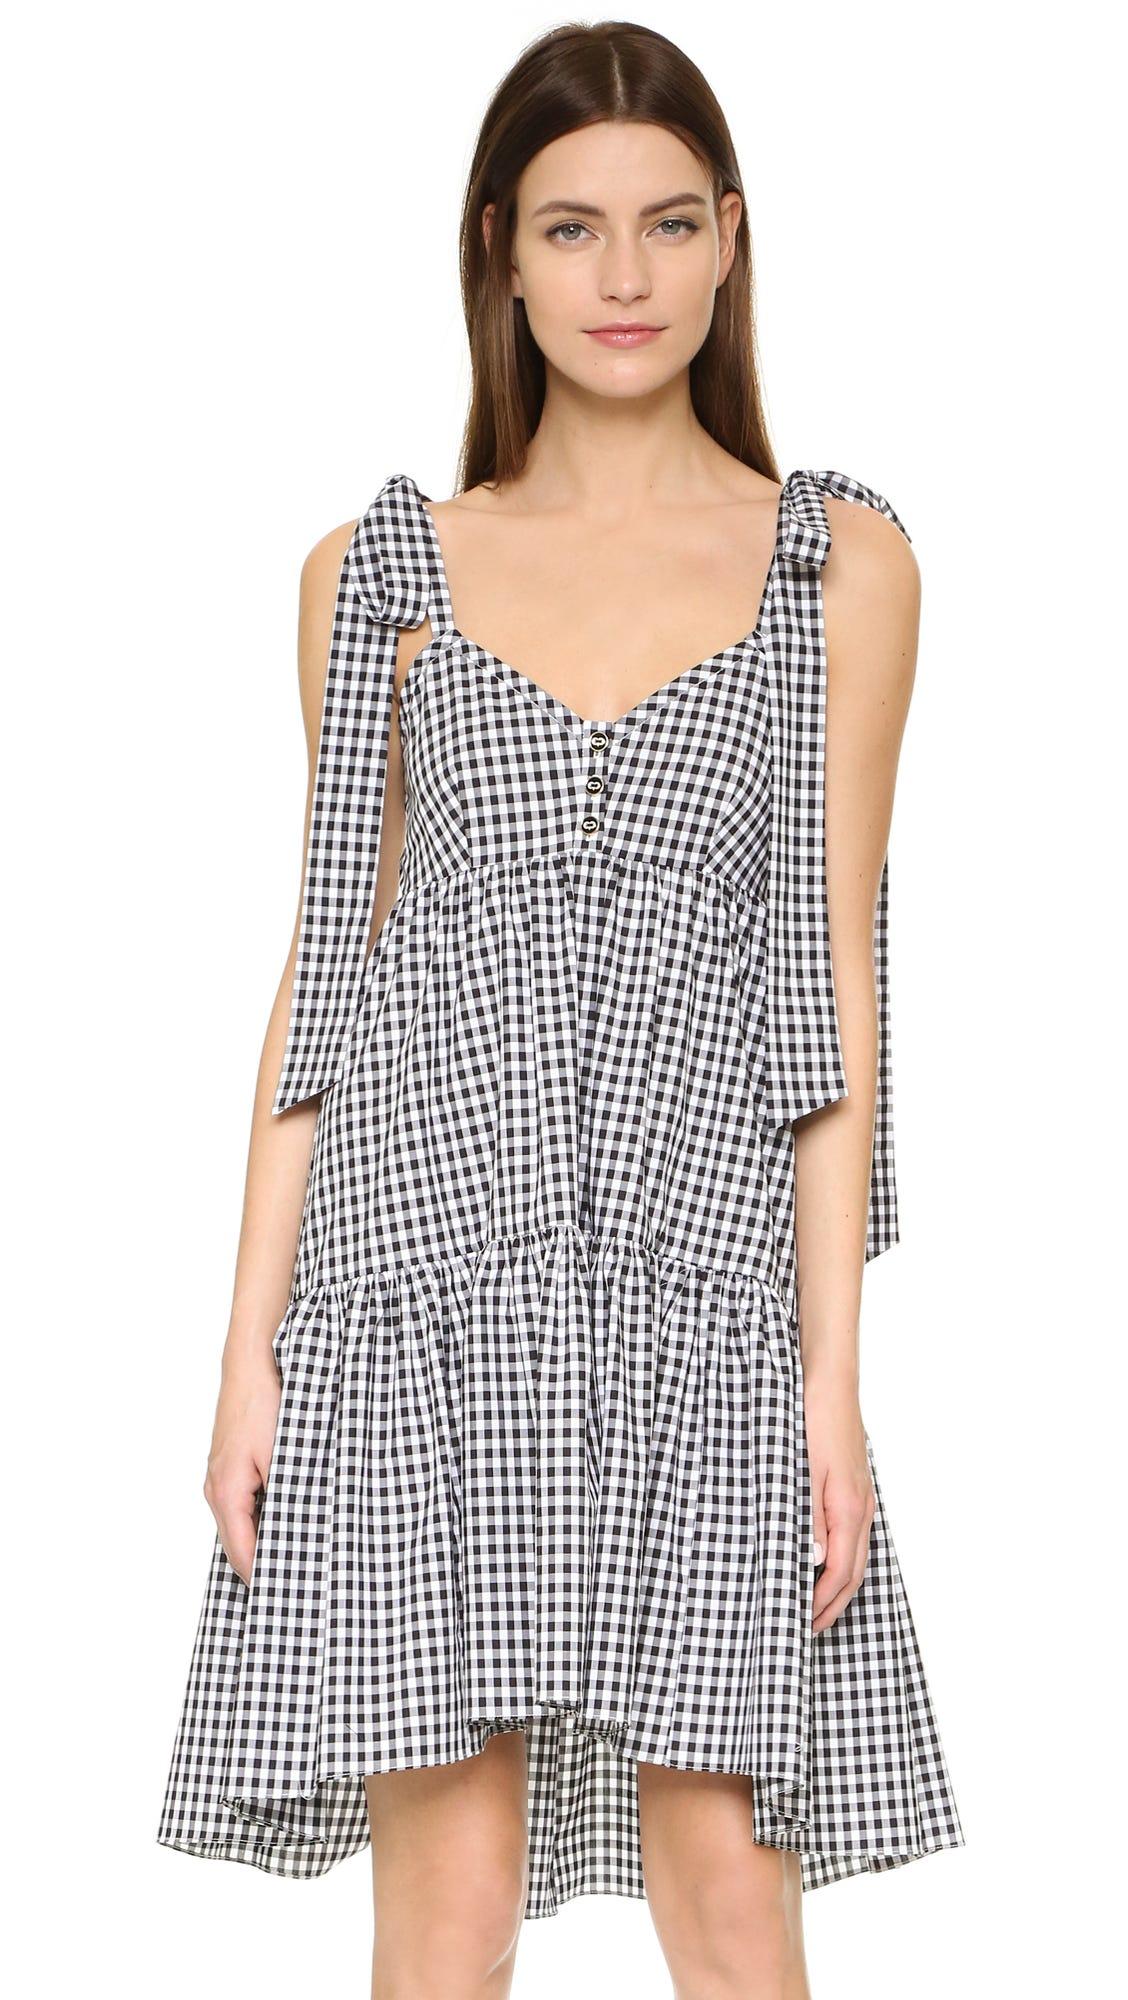 a1f74a76120ab4 Gingham Print Spring Clothing Shirt Dress Tops